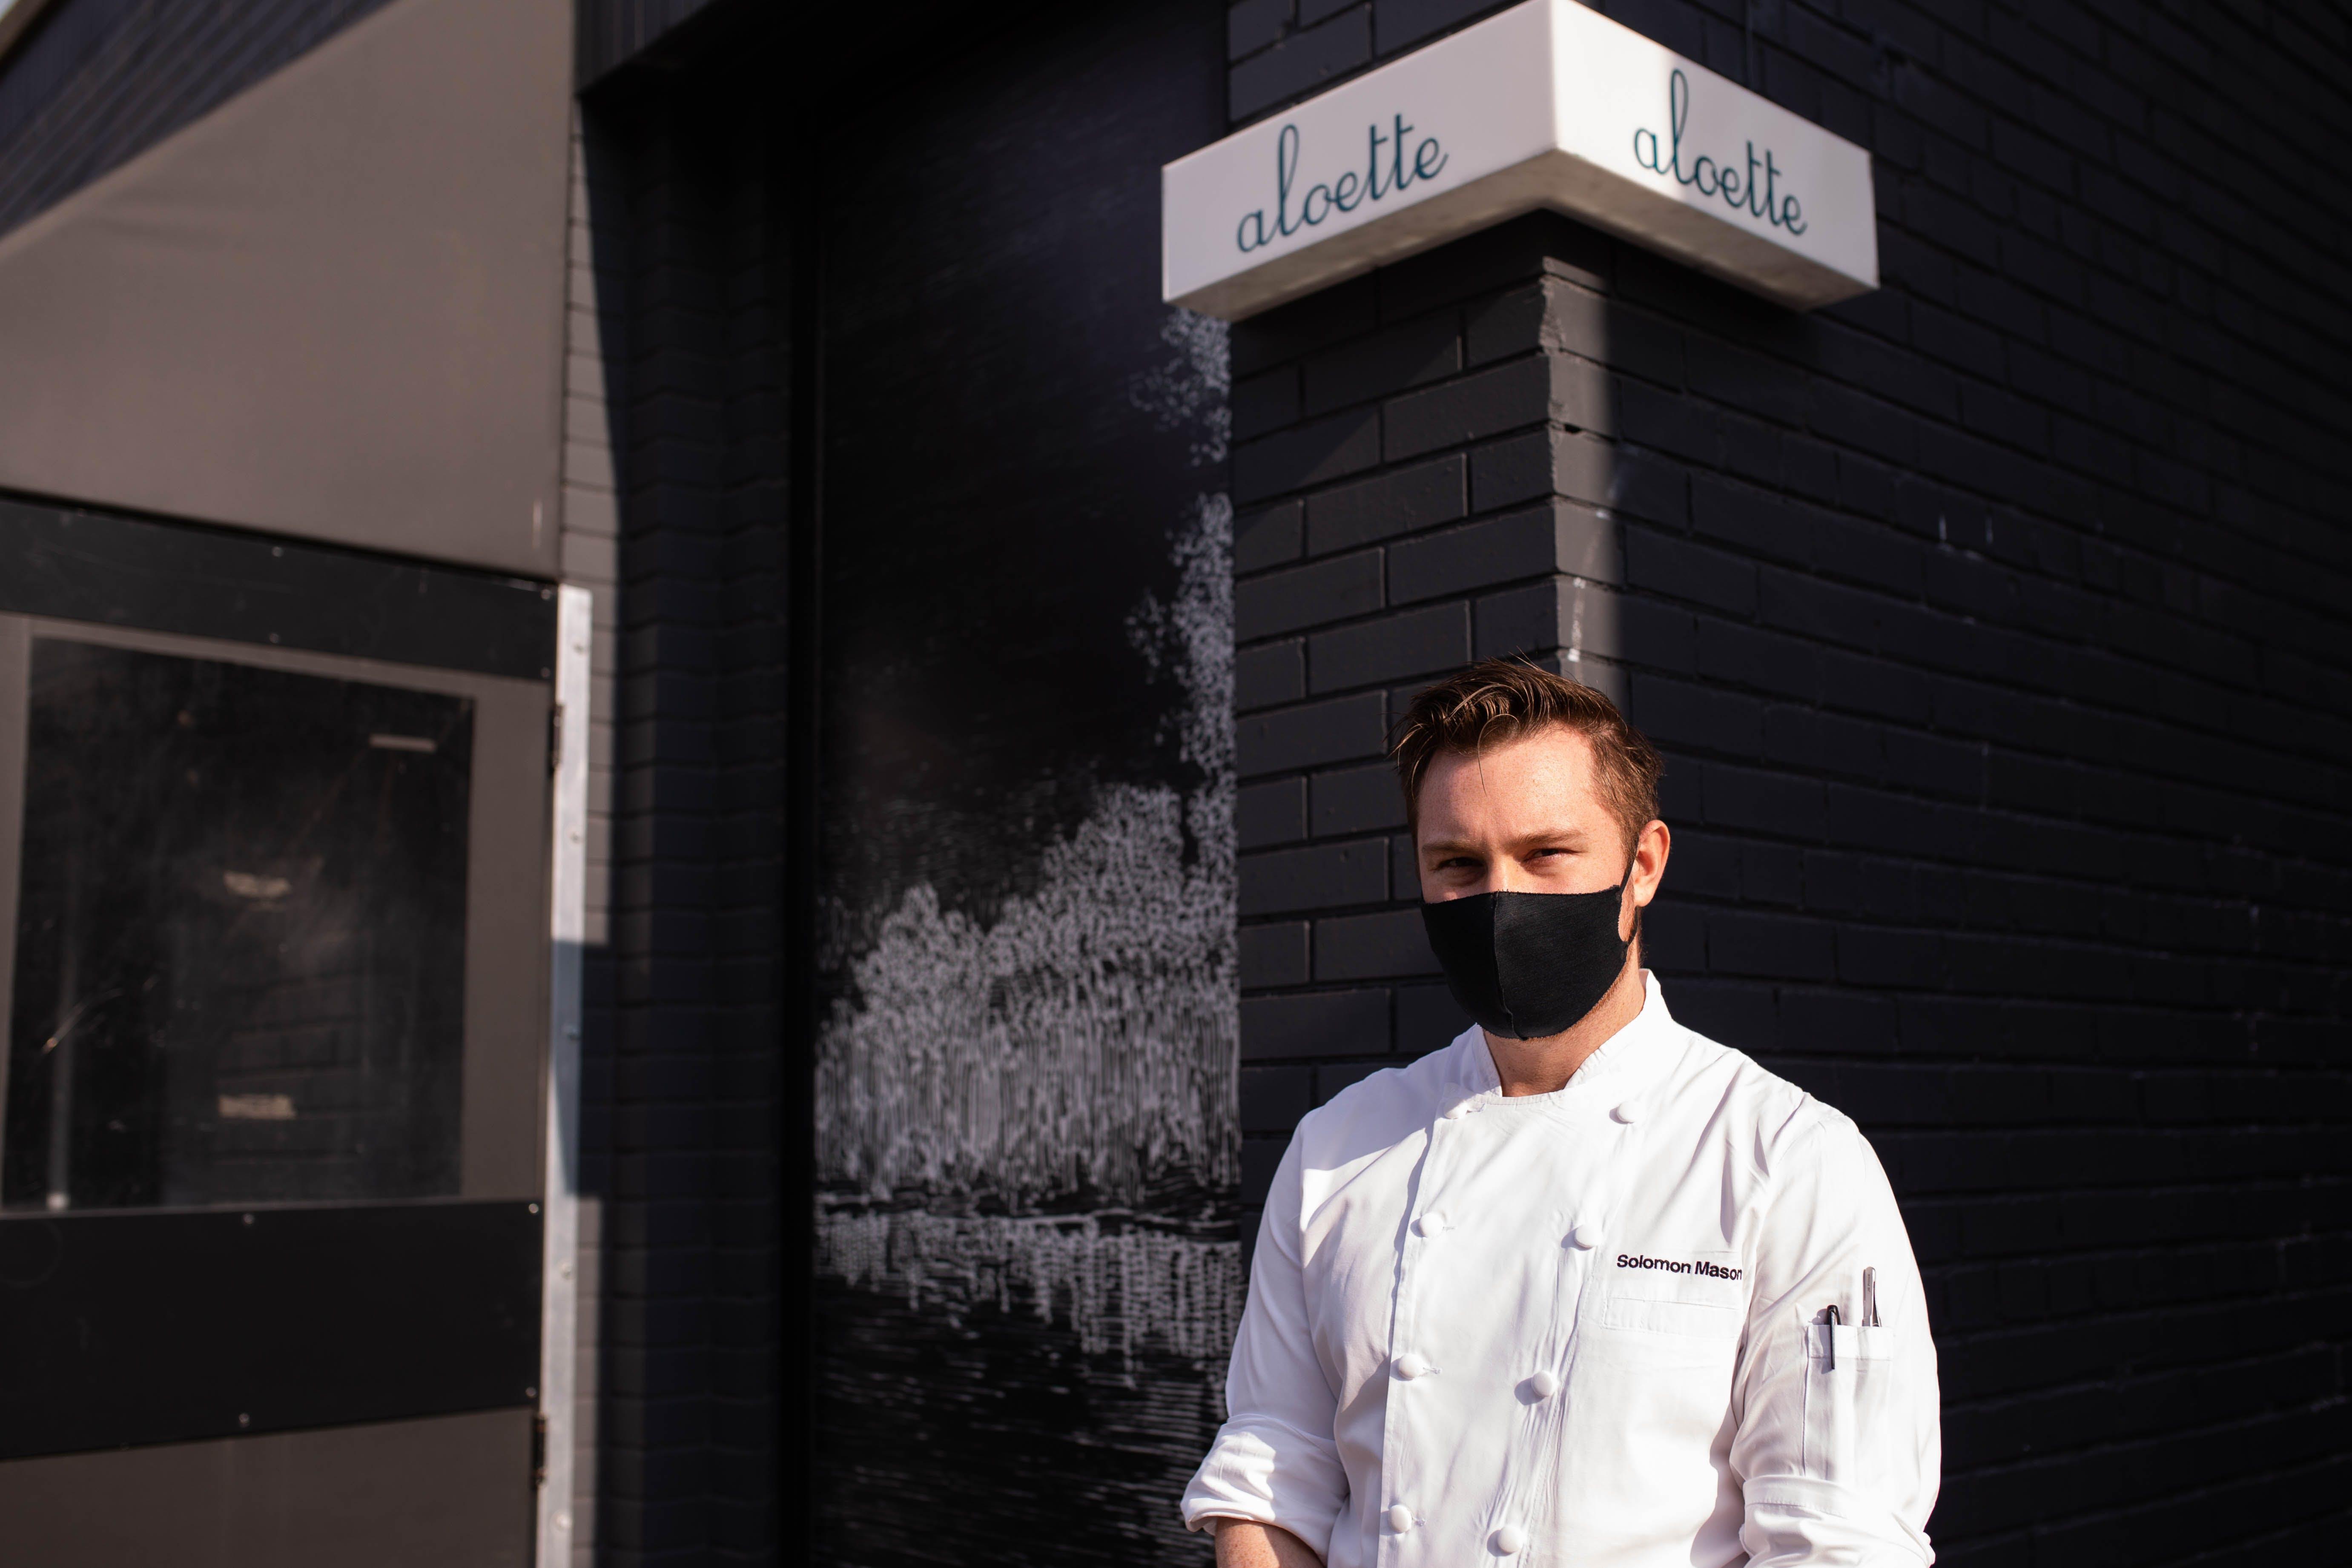 Solomon Mason stands out front of Toronto restaurant Aloette.